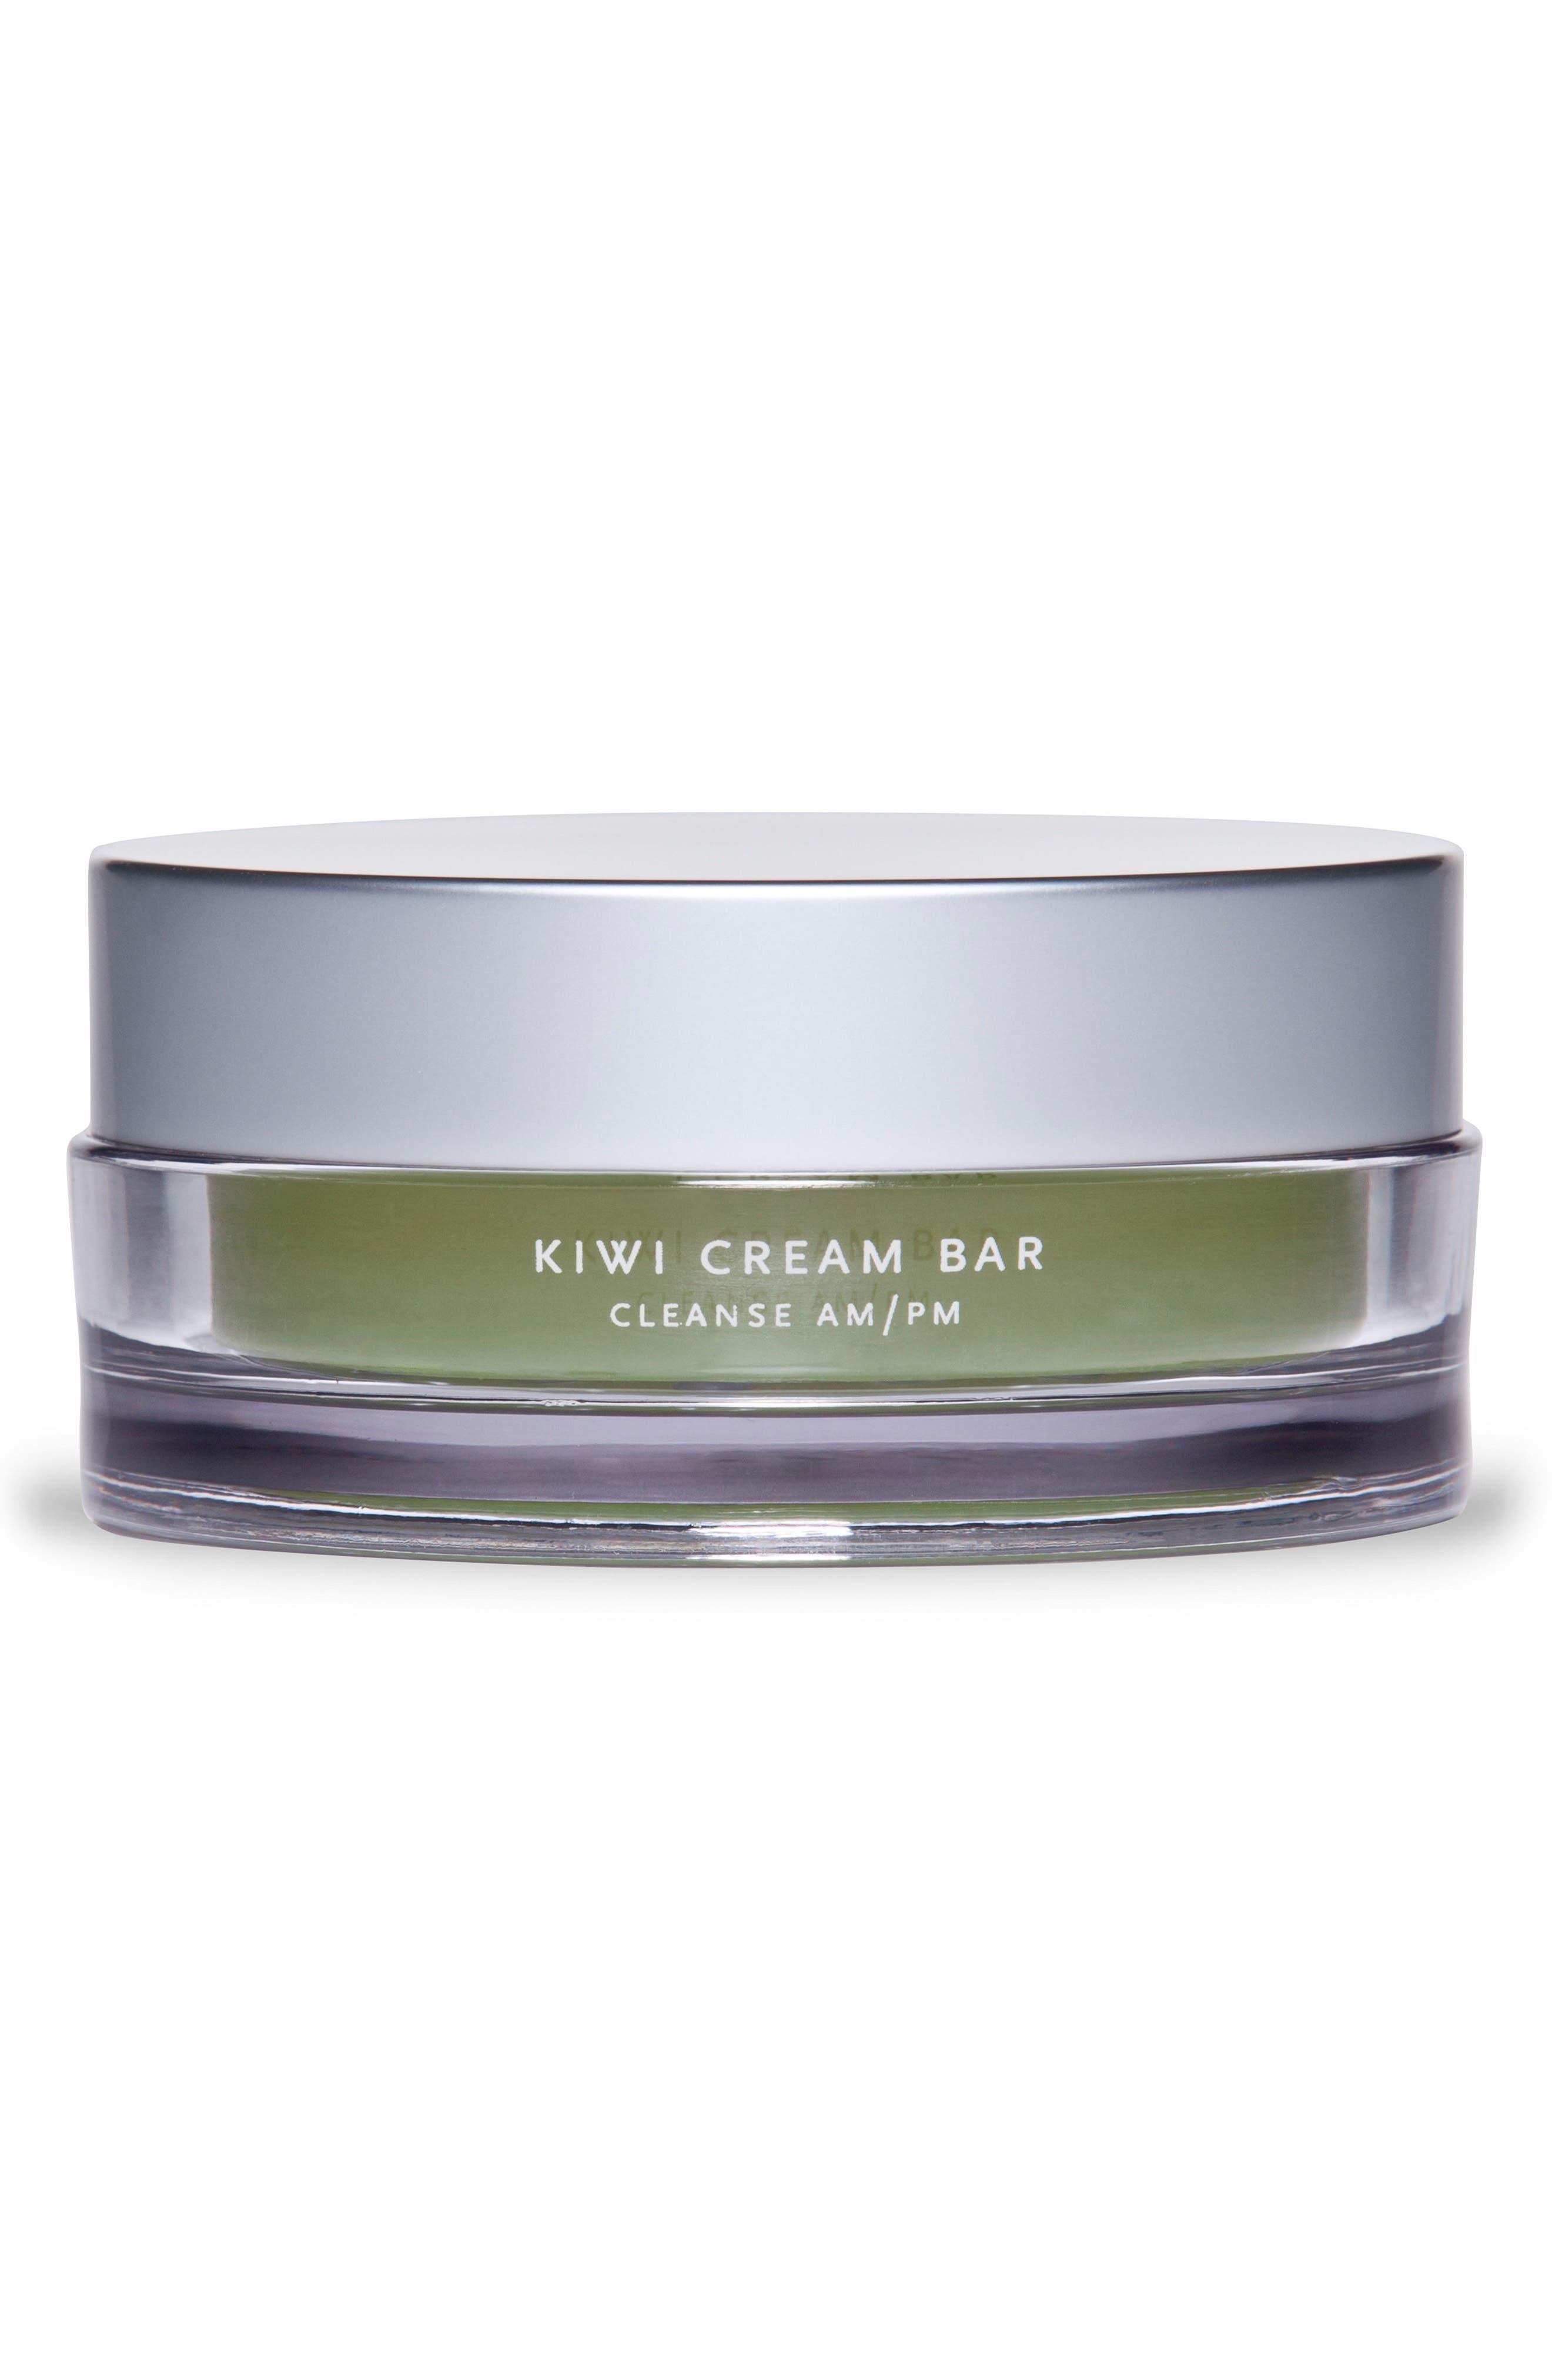 ARCONA Kiwi Cream Bar Facial Cleanser